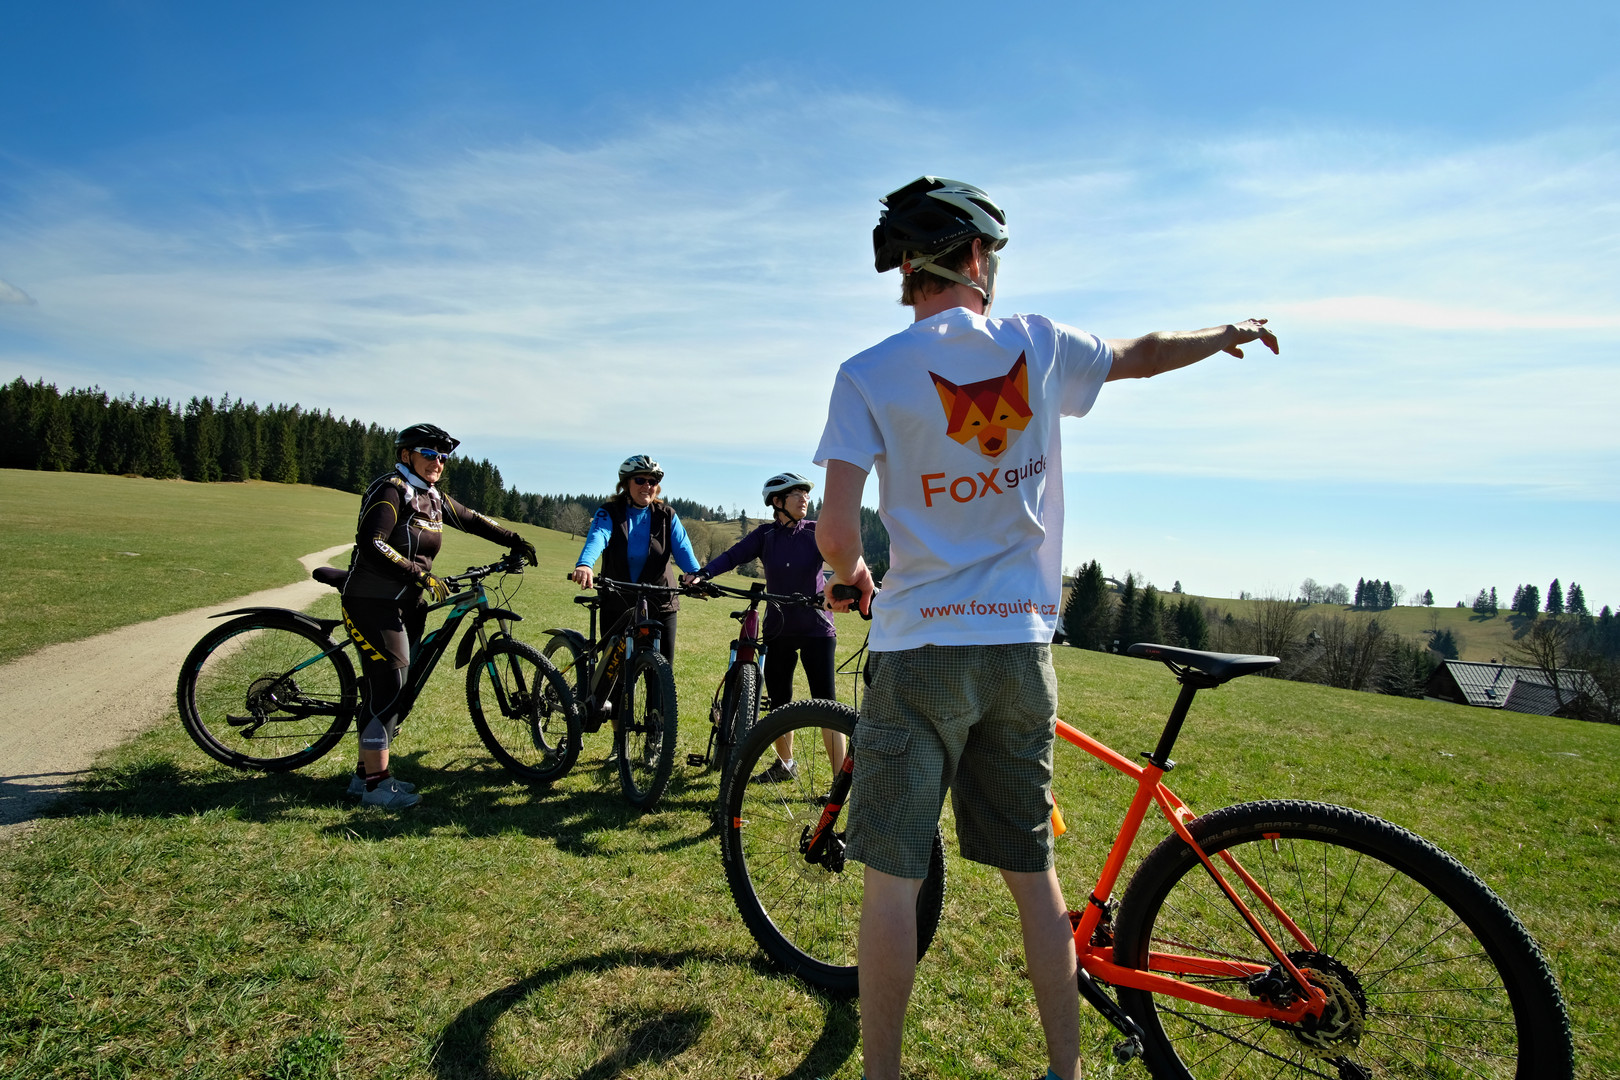 singltrek fox guide jizerské hory